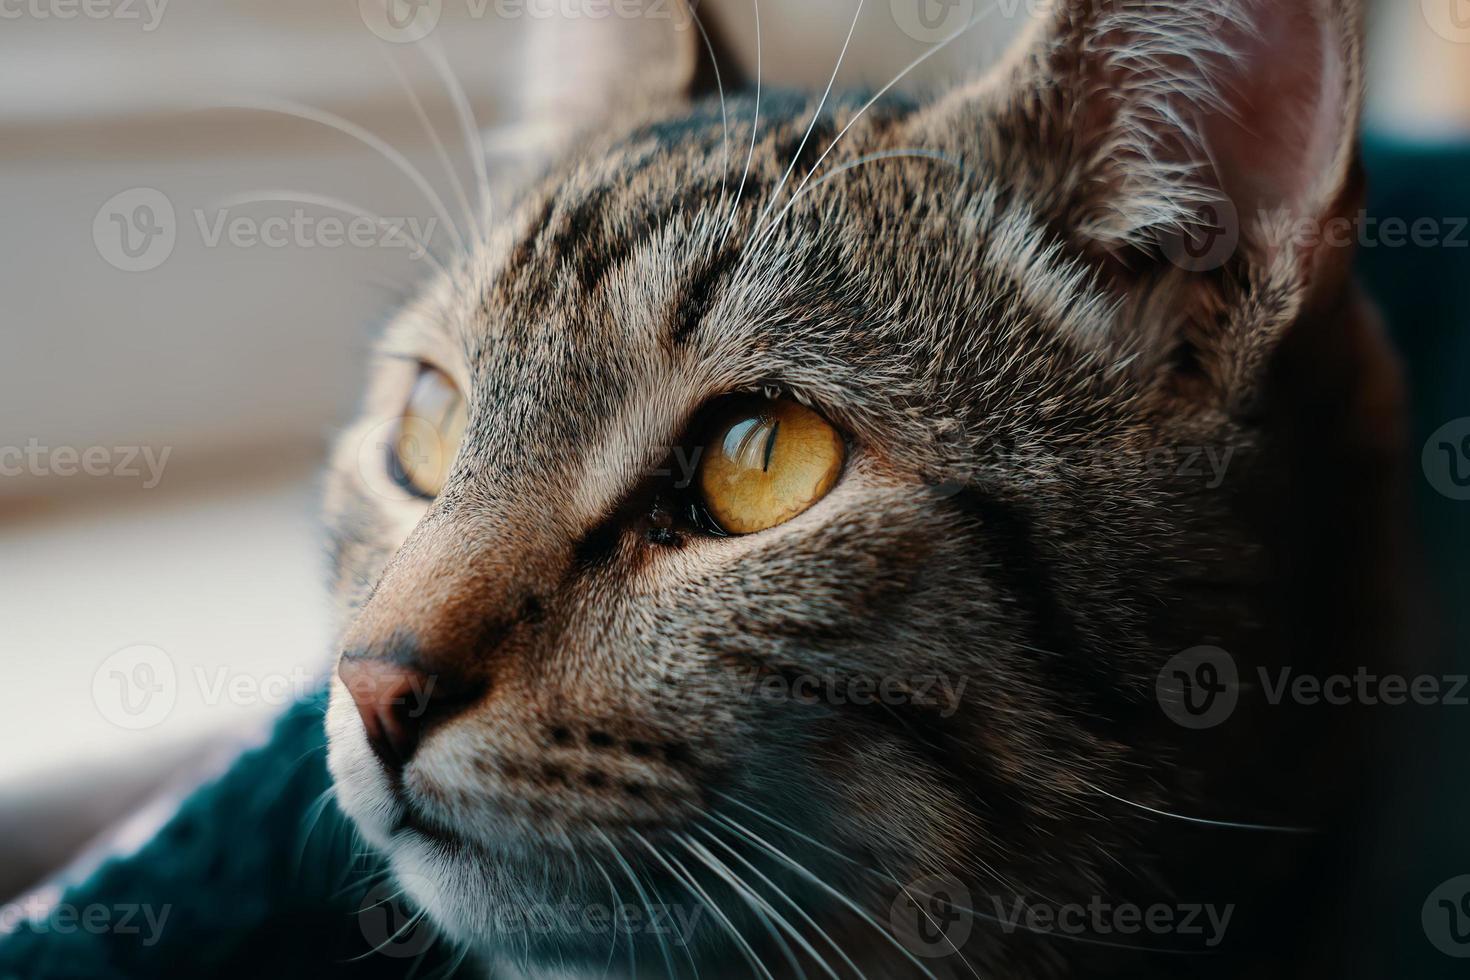 Tabby cat close-up photo